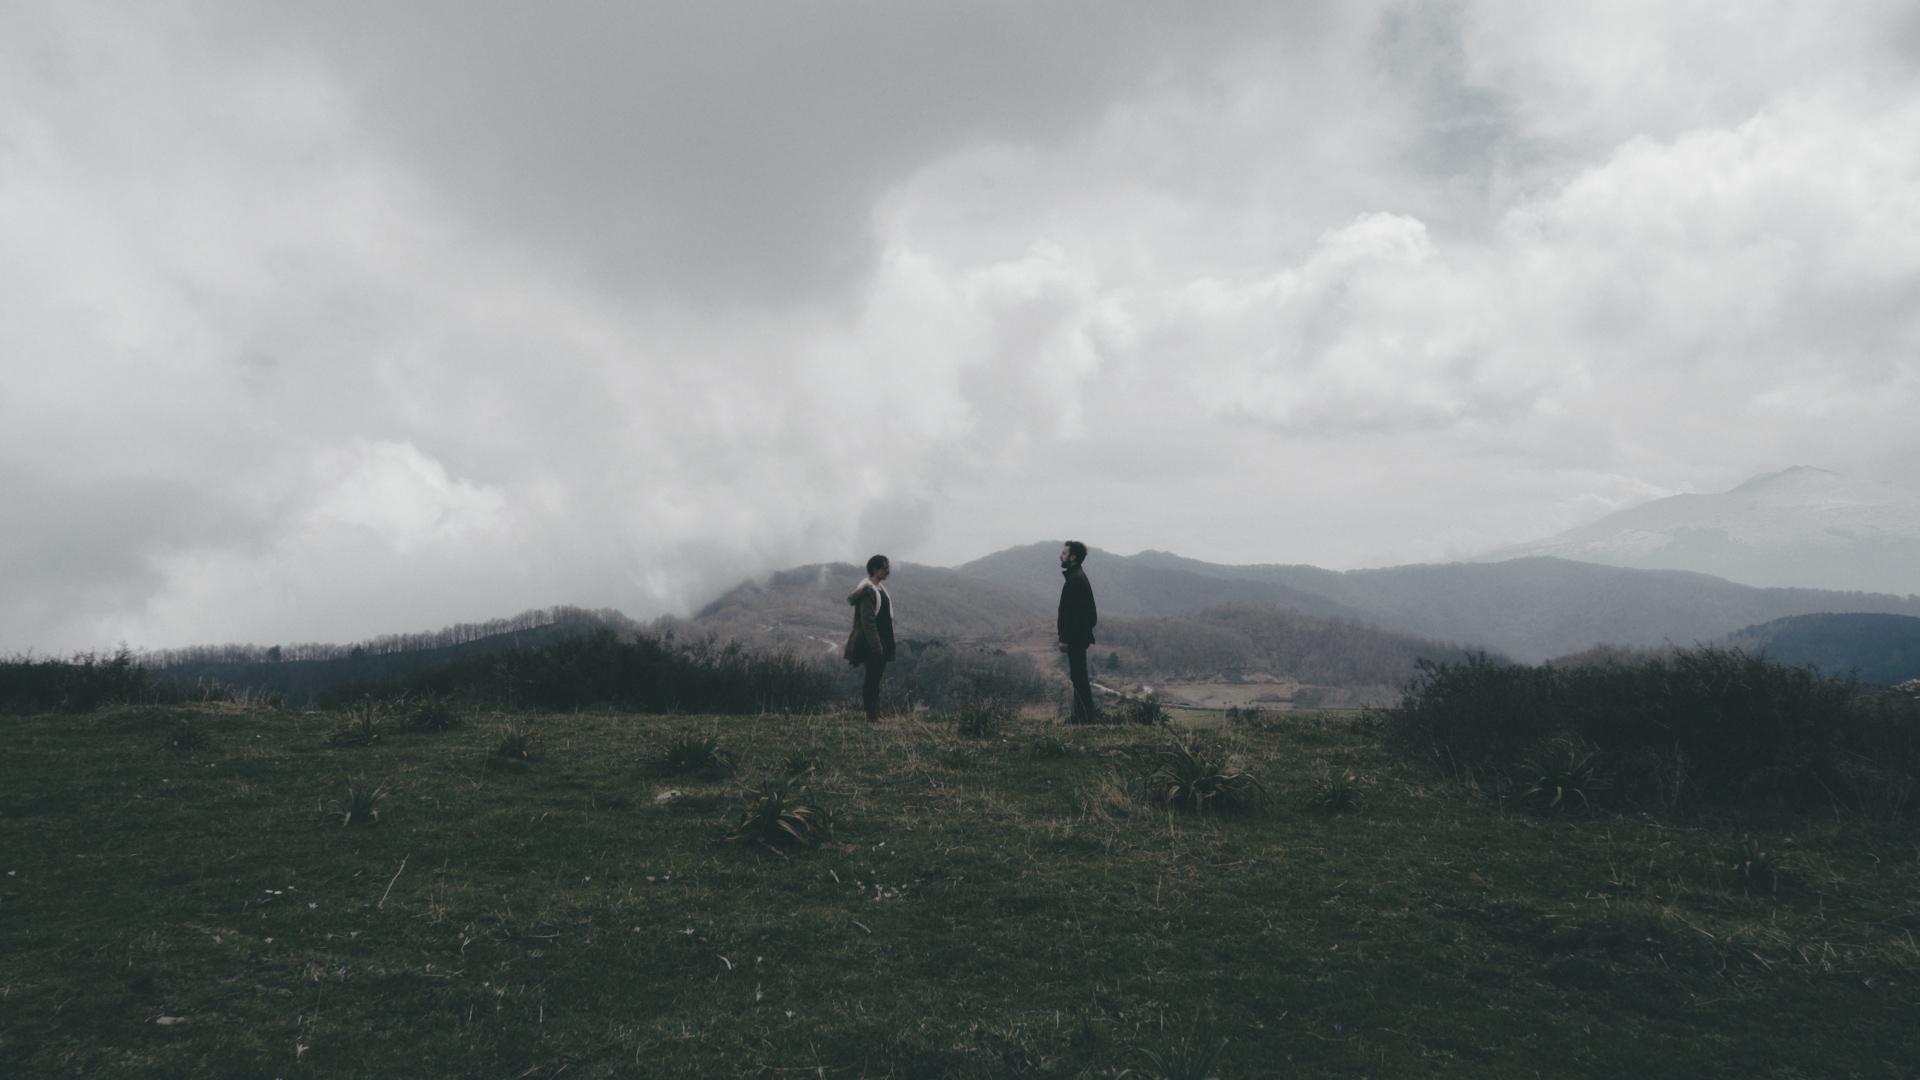 VeiveCura – Too Late (Emanuele Torre, Michela D'Amico)